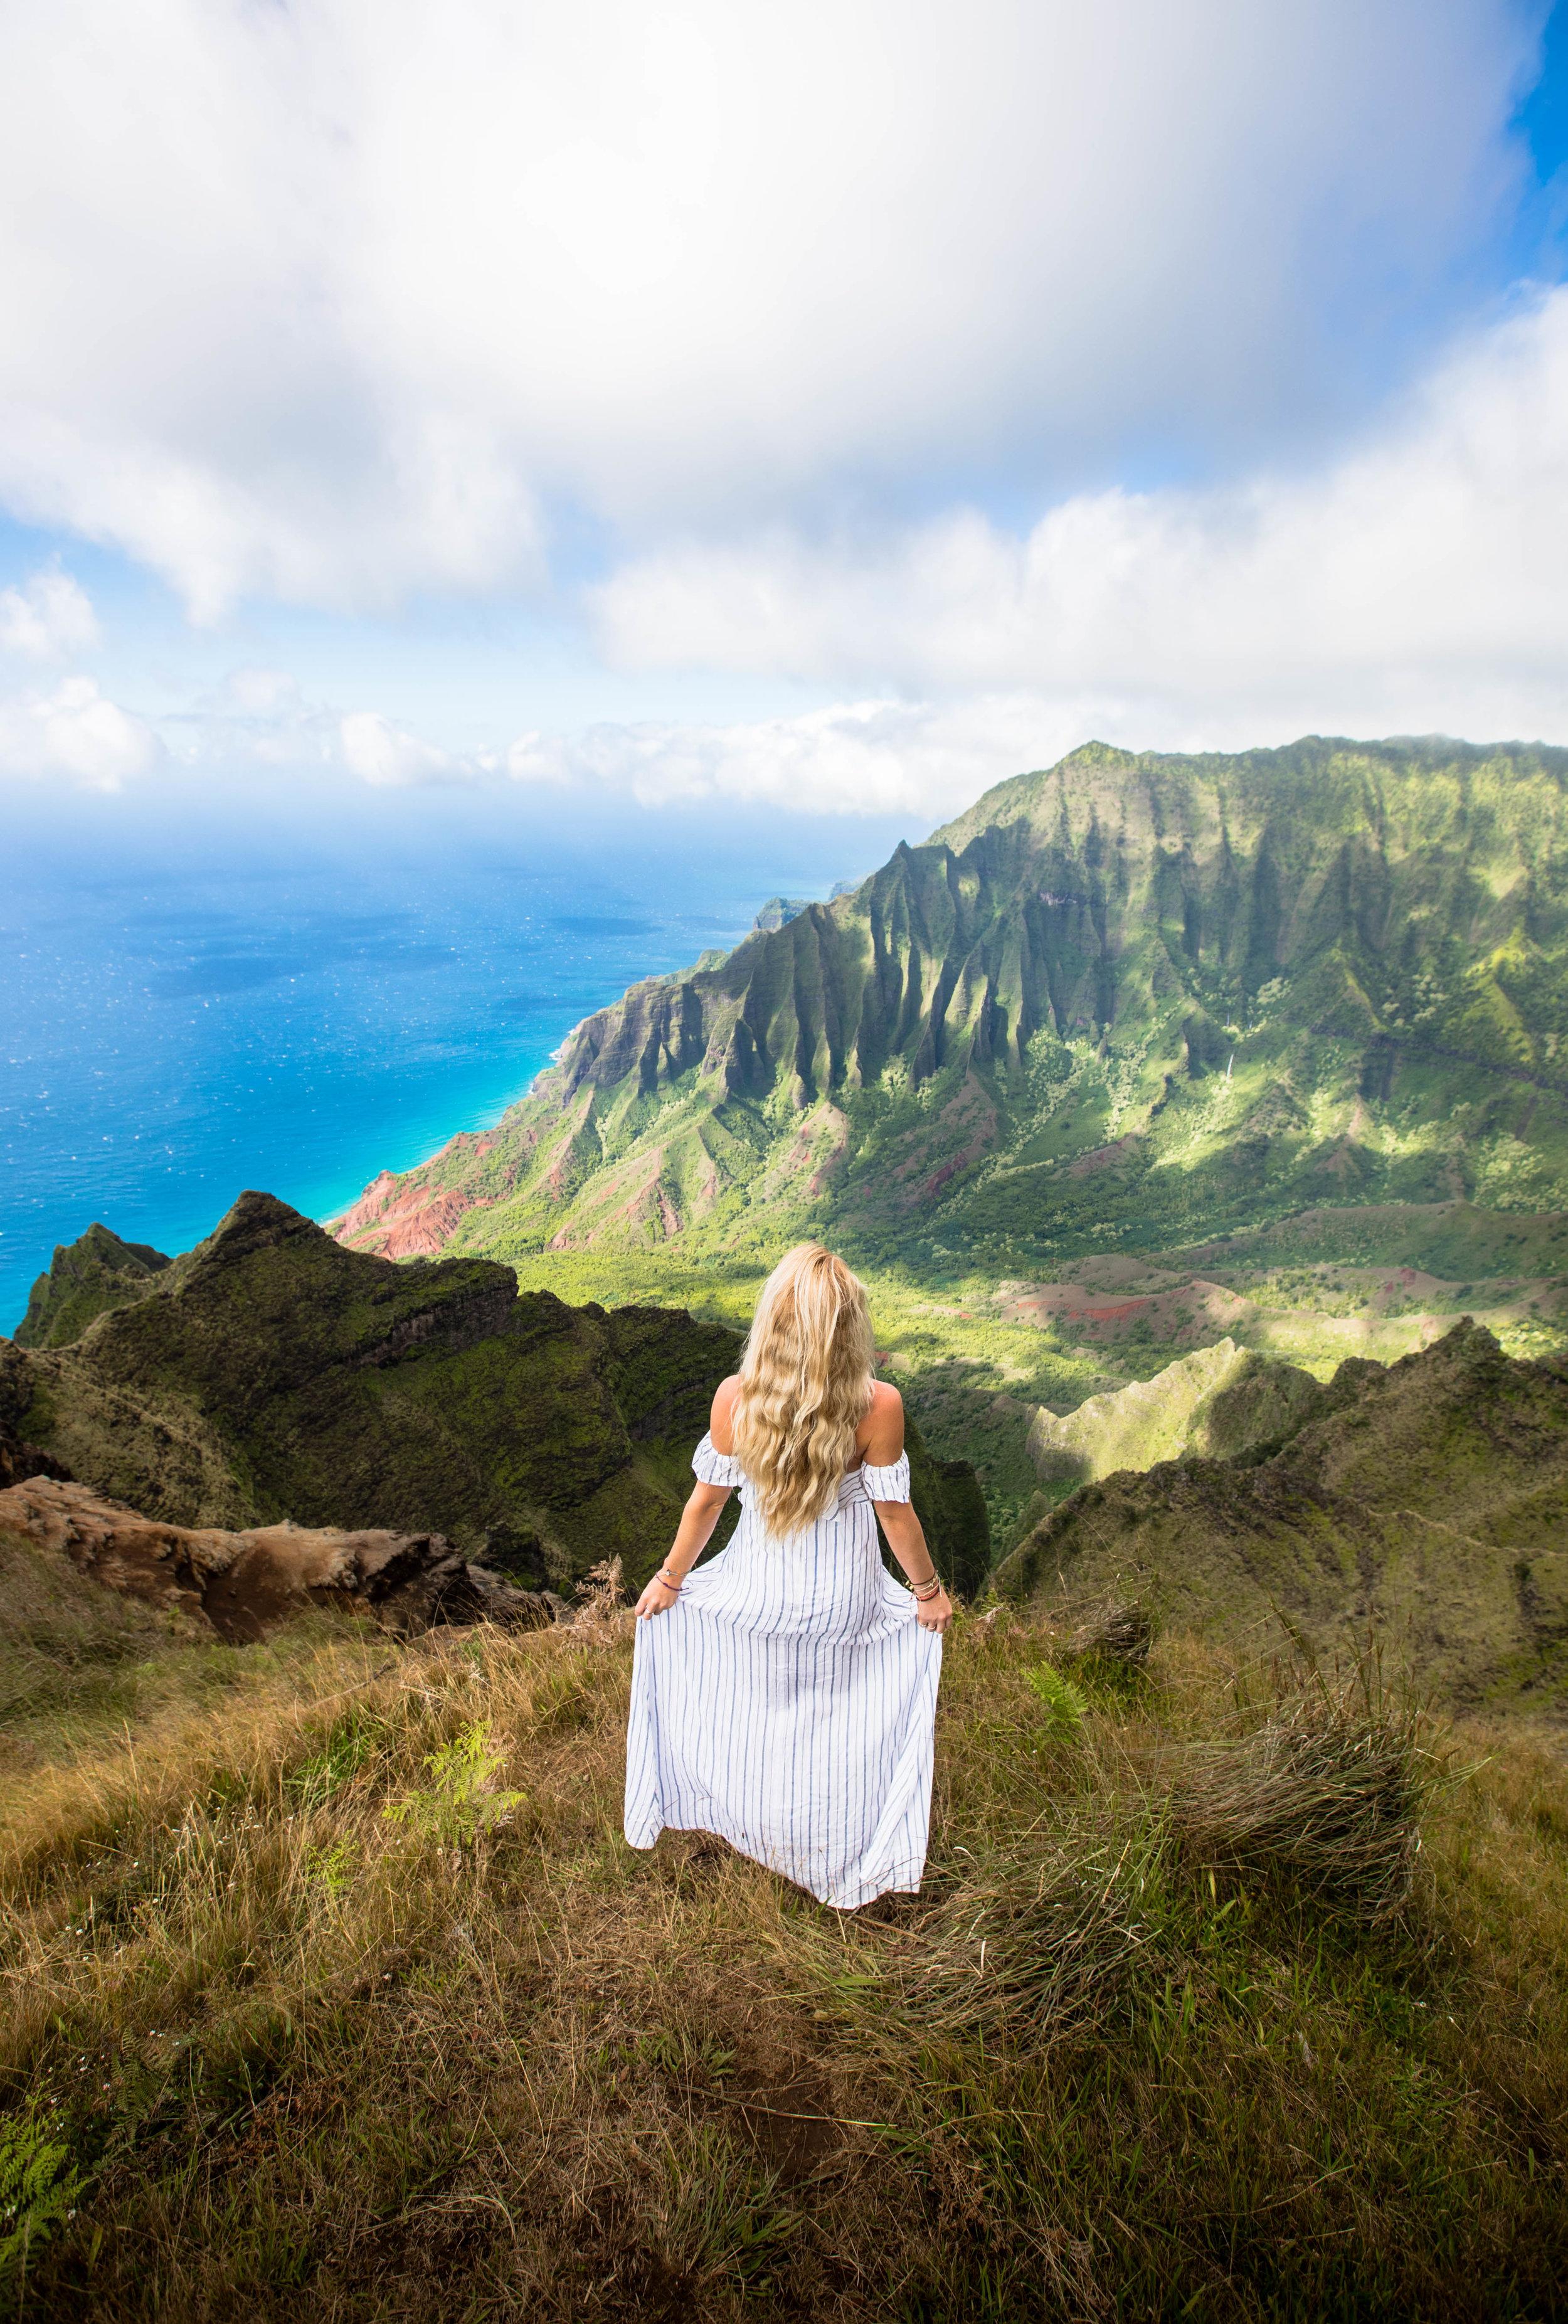 Hawaii ridge line by Connor Trimble